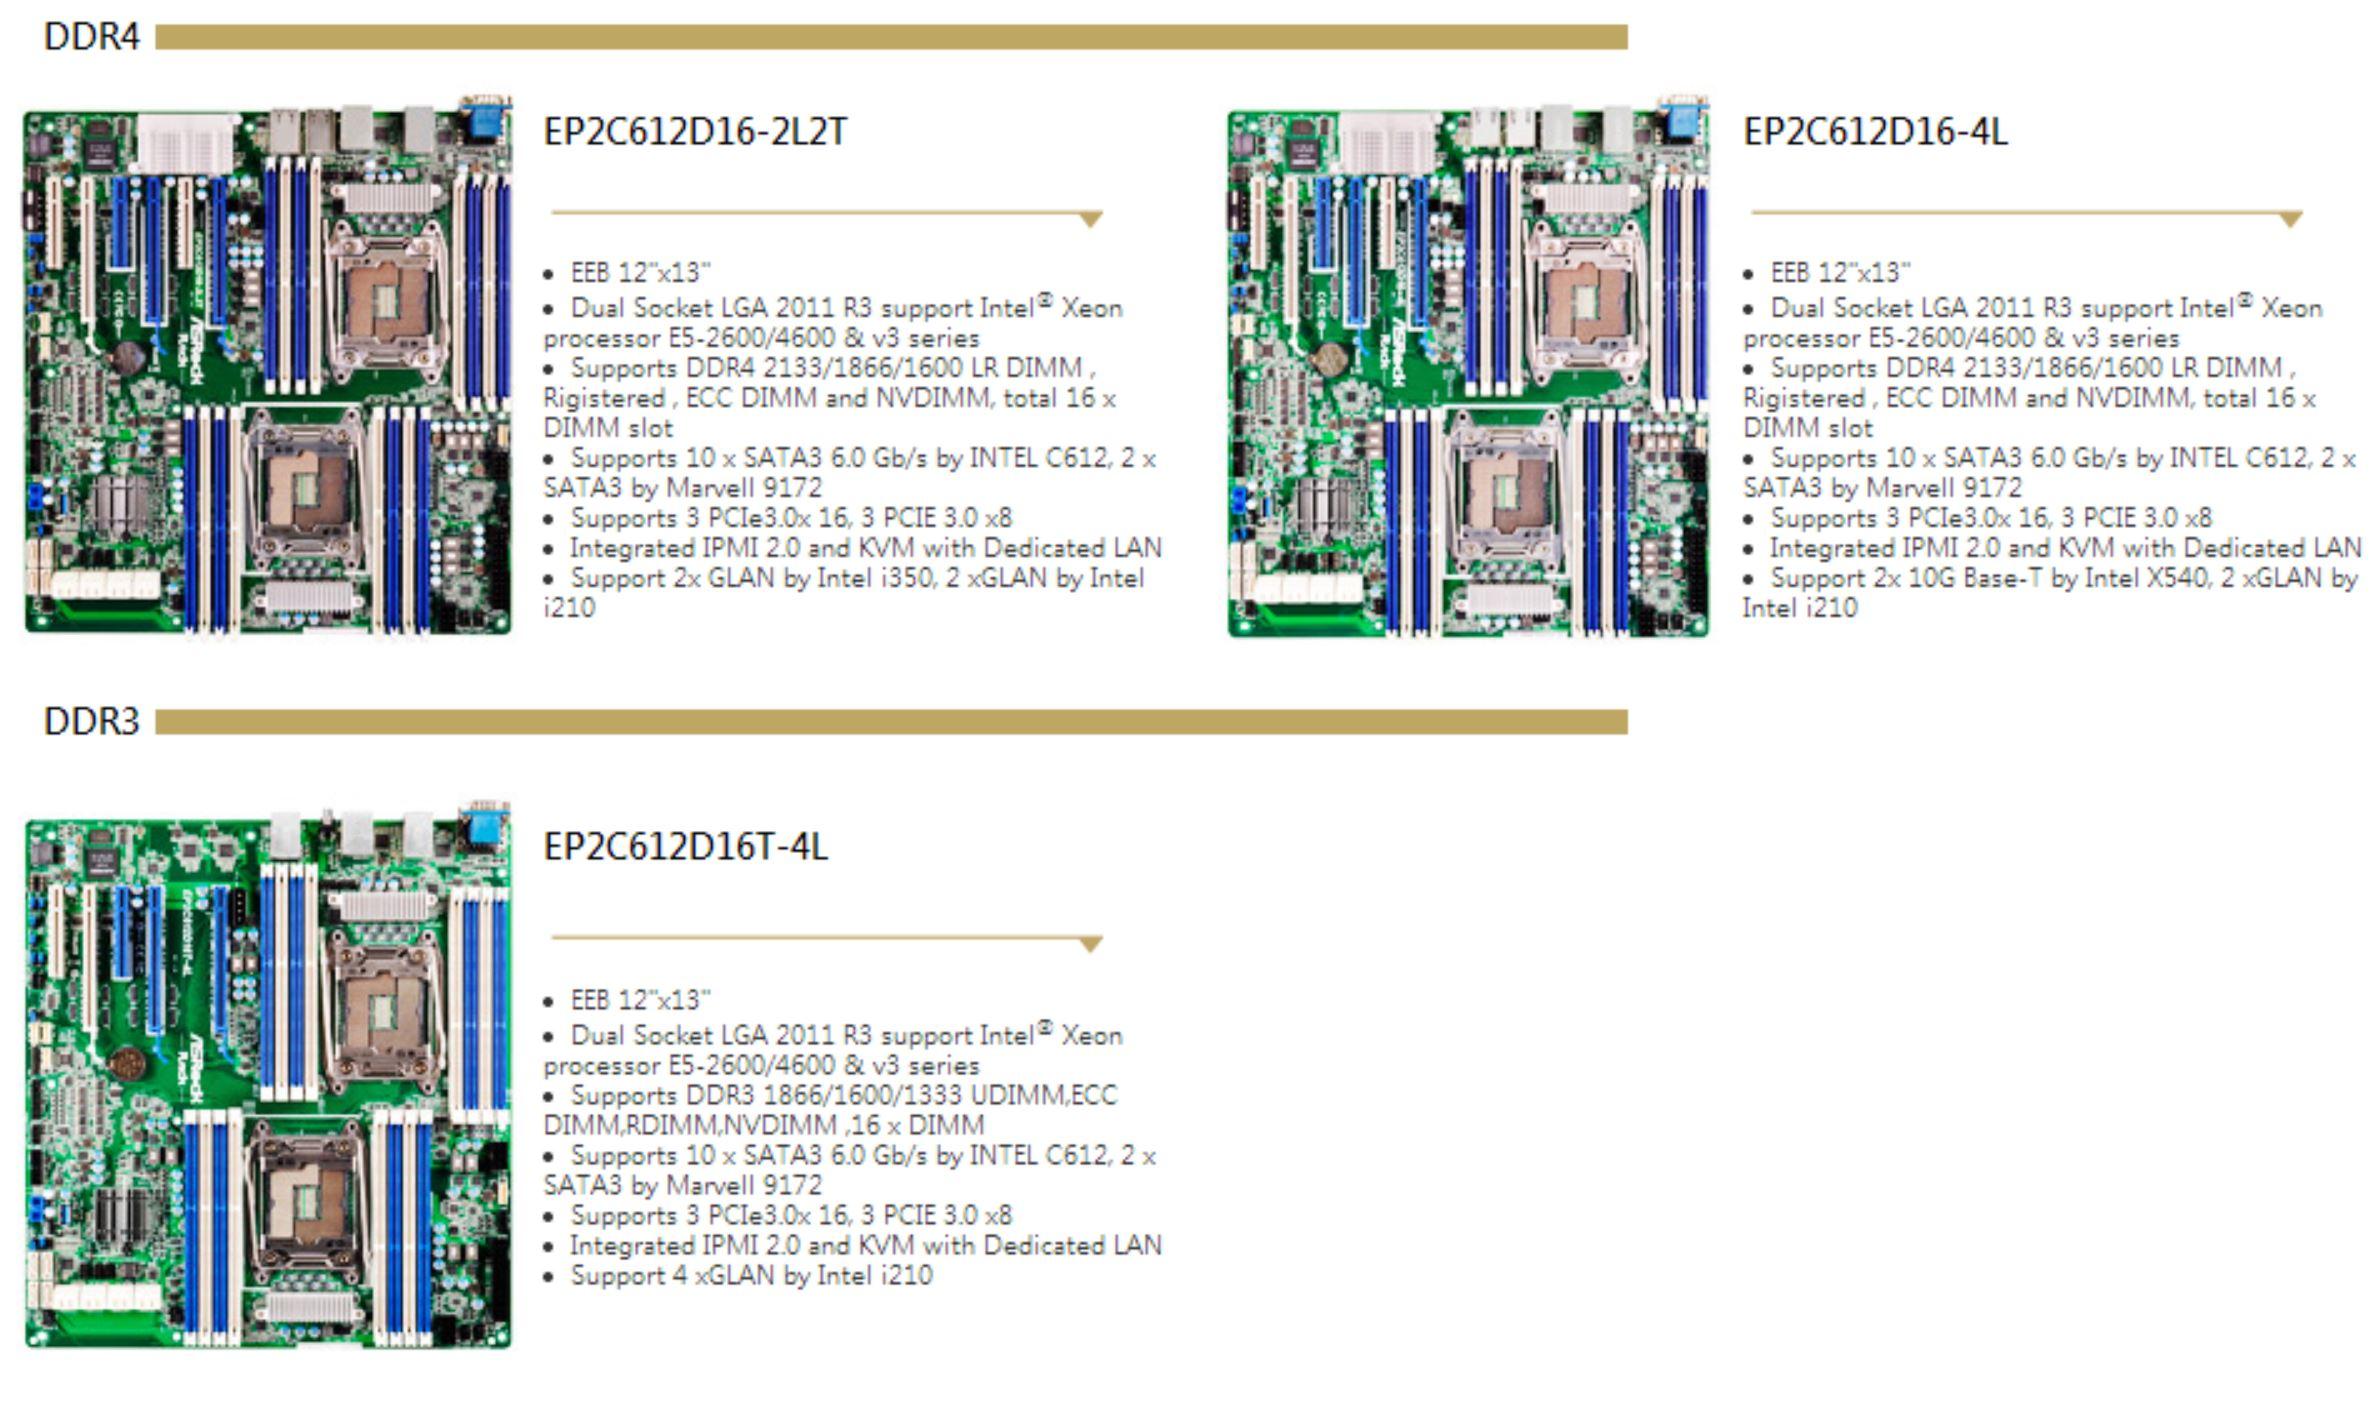 ASRock Rack Xeon E5-2600 V3 HPC